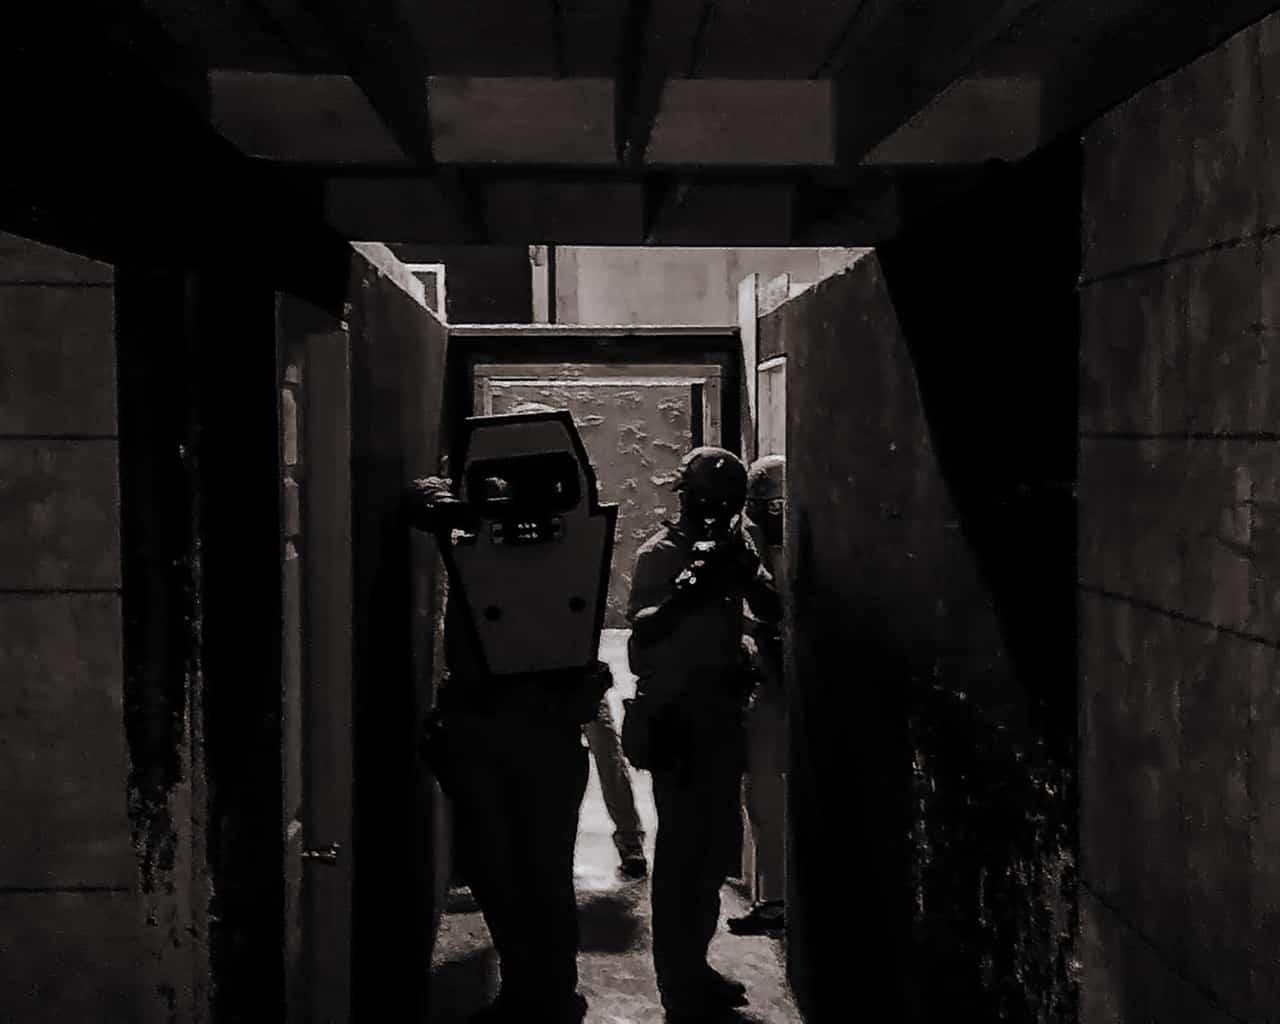 Entry team working hallways with shield